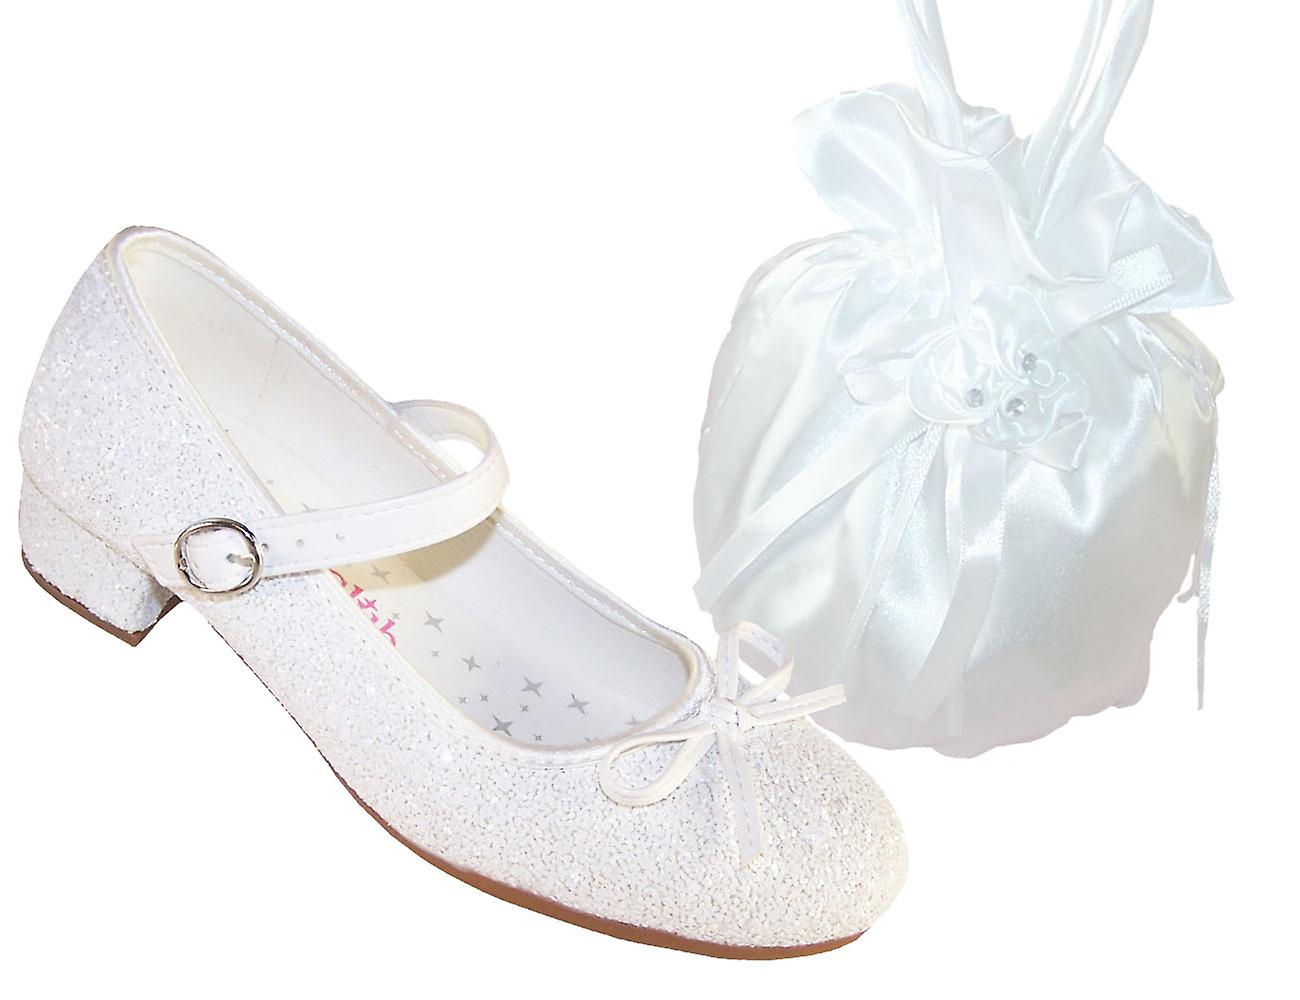 Girls bianca sparkly special occasion heeled scarpe and satin bag | Portare-resistendo  | Scolaro/Signora Scarpa